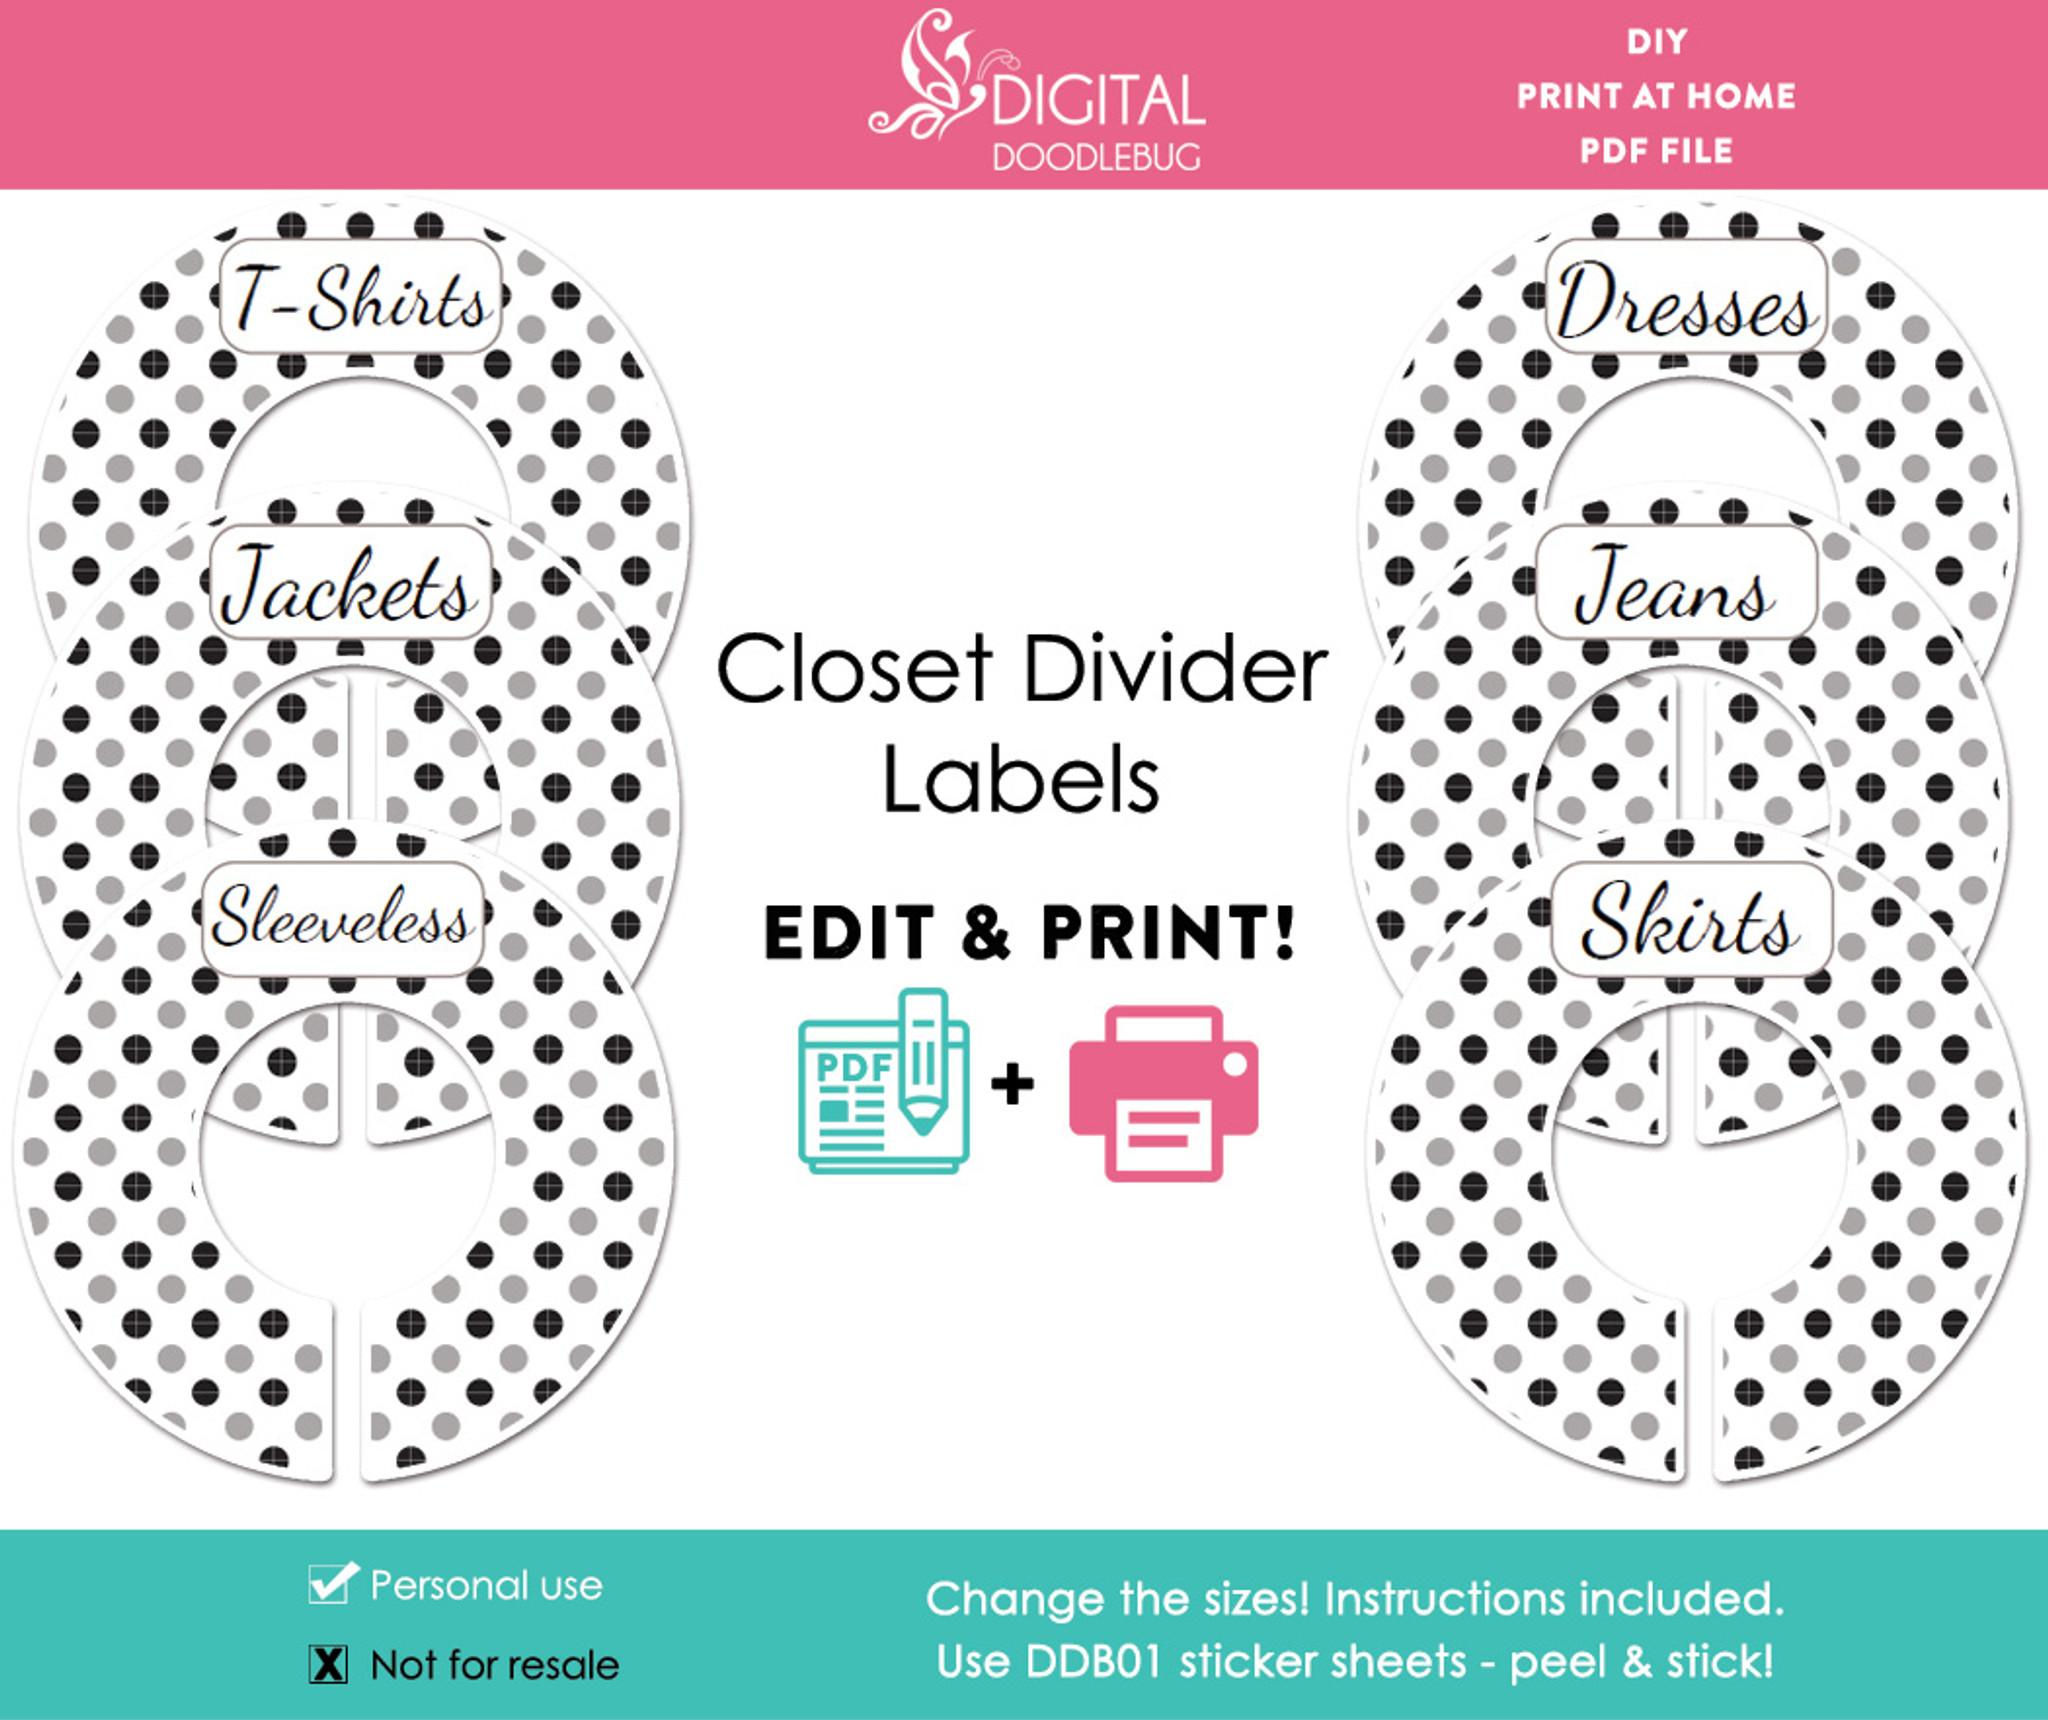 image regarding Printable Closet Dividers named Black Grey Polka Dot Printable Closet Divider Label Template